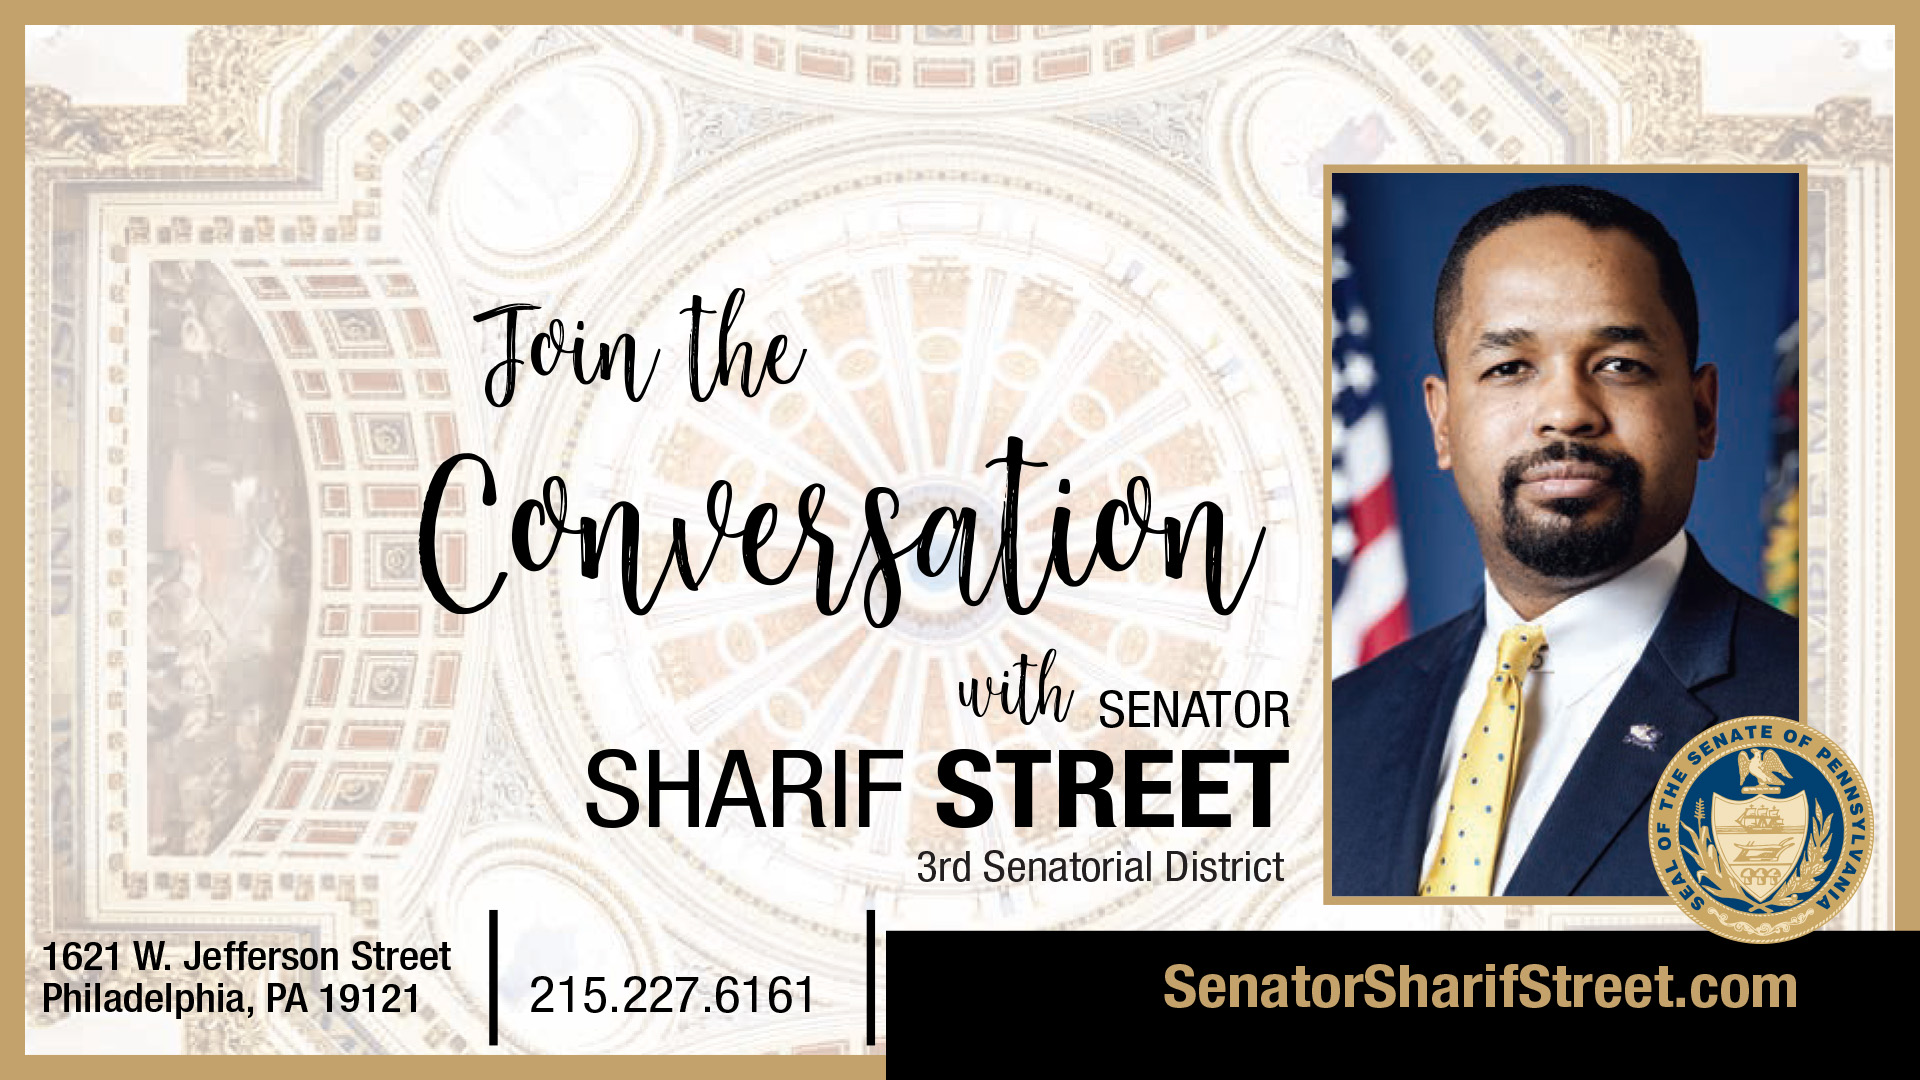 Pennsylvania State Senator Sharif Street